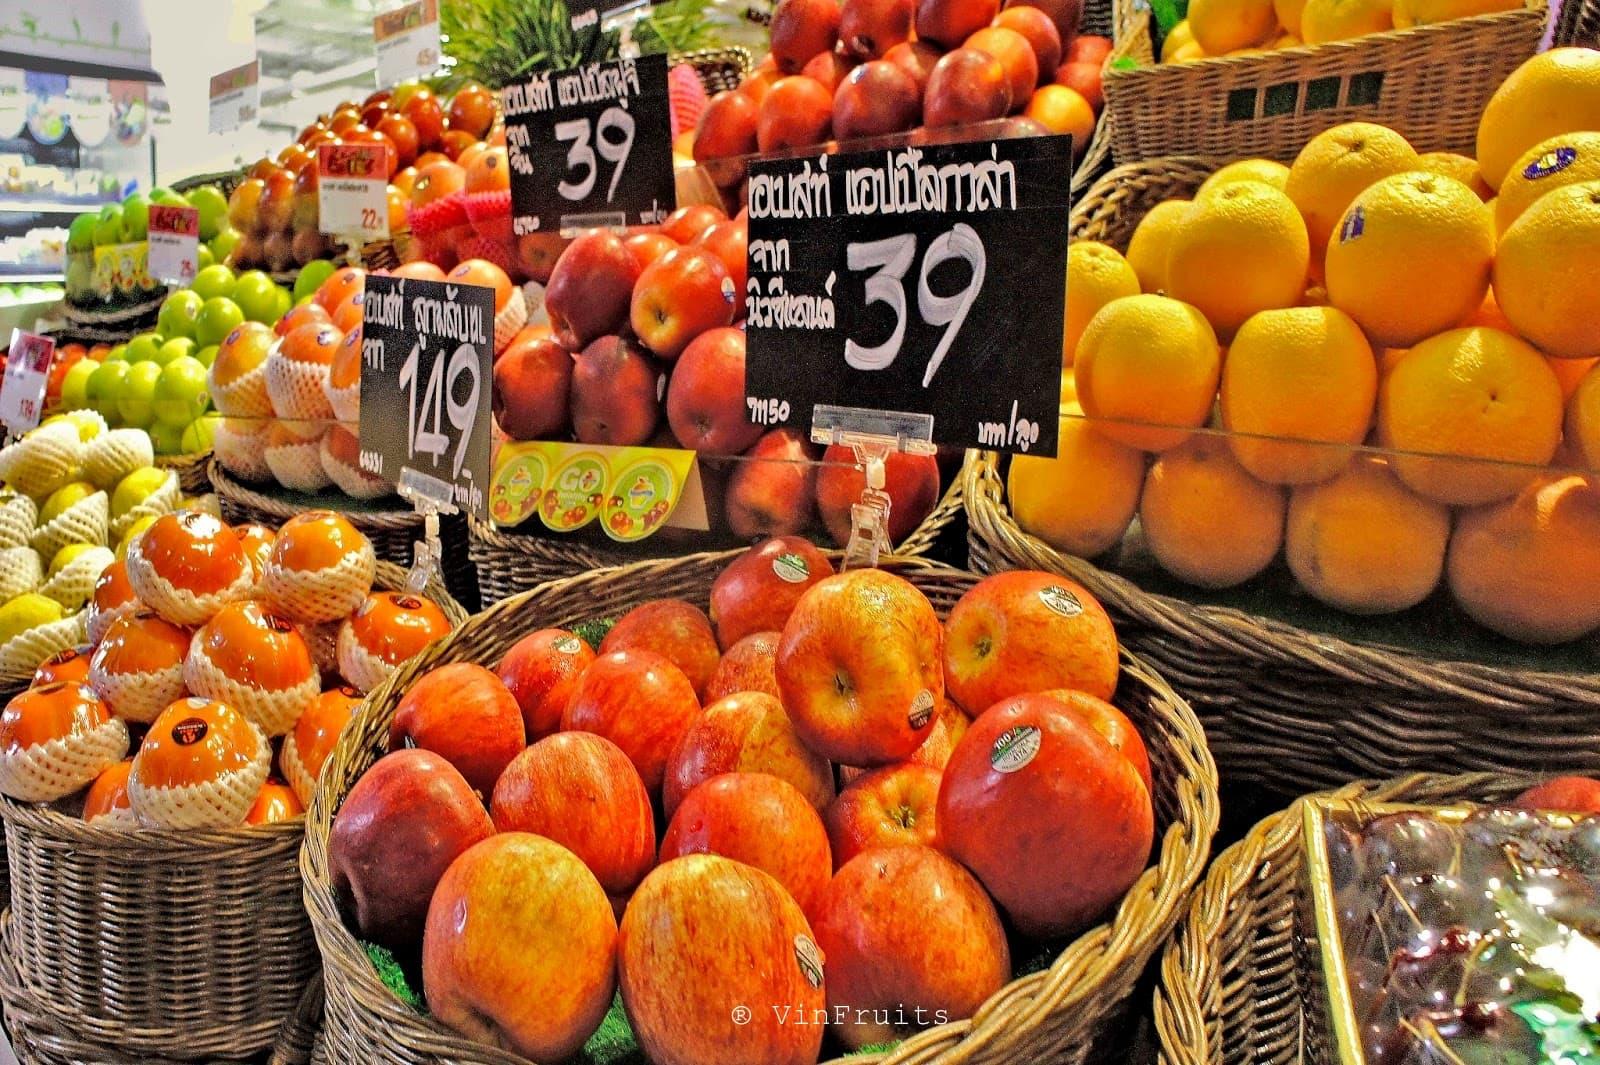 trai cay nhap khau tphcm - vinfruits